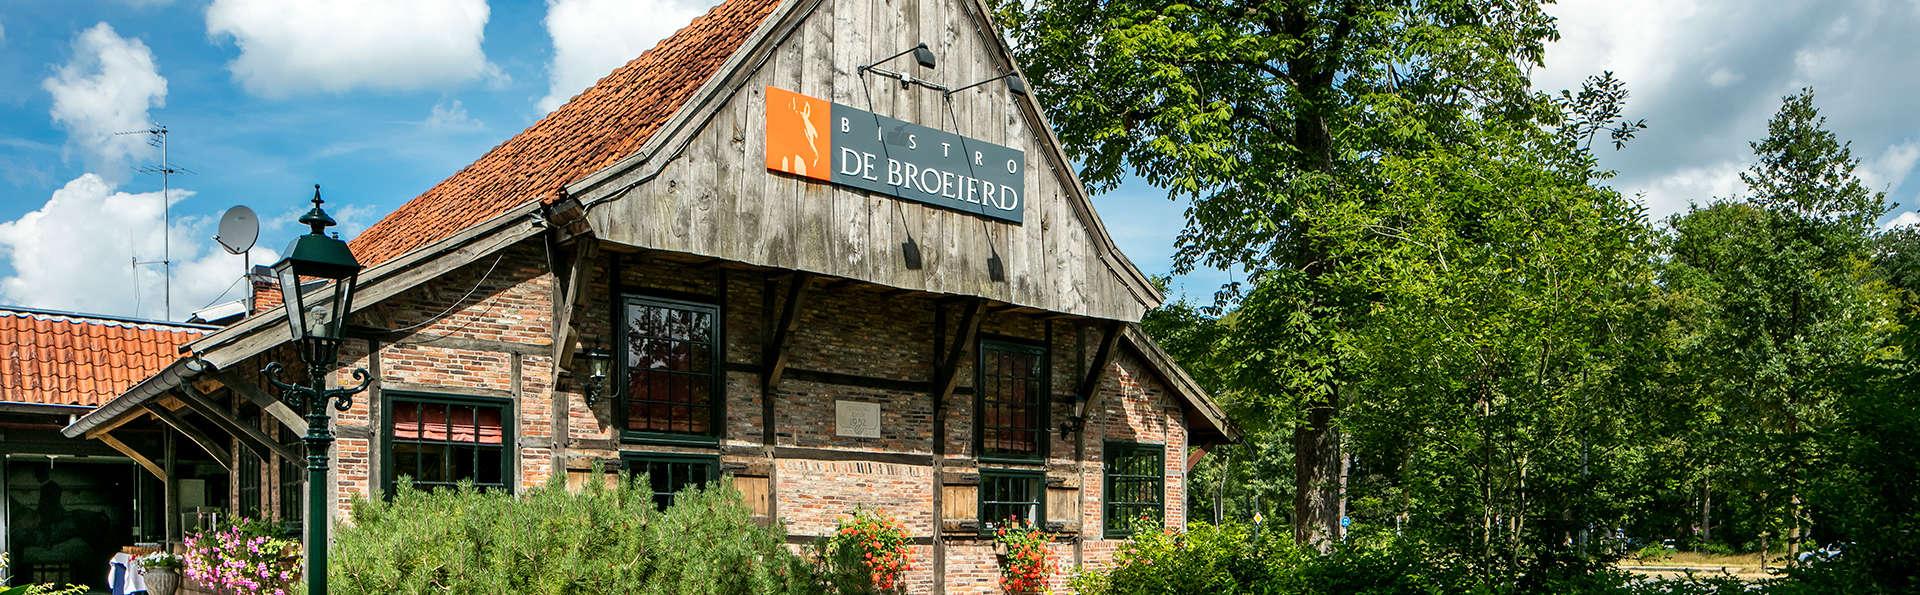 Fletcher Hotel-Restaurant De Broeierd-Enschede (Former Hampshire Hotel De Broeierd-Enschede) - Edit_Front.jpg